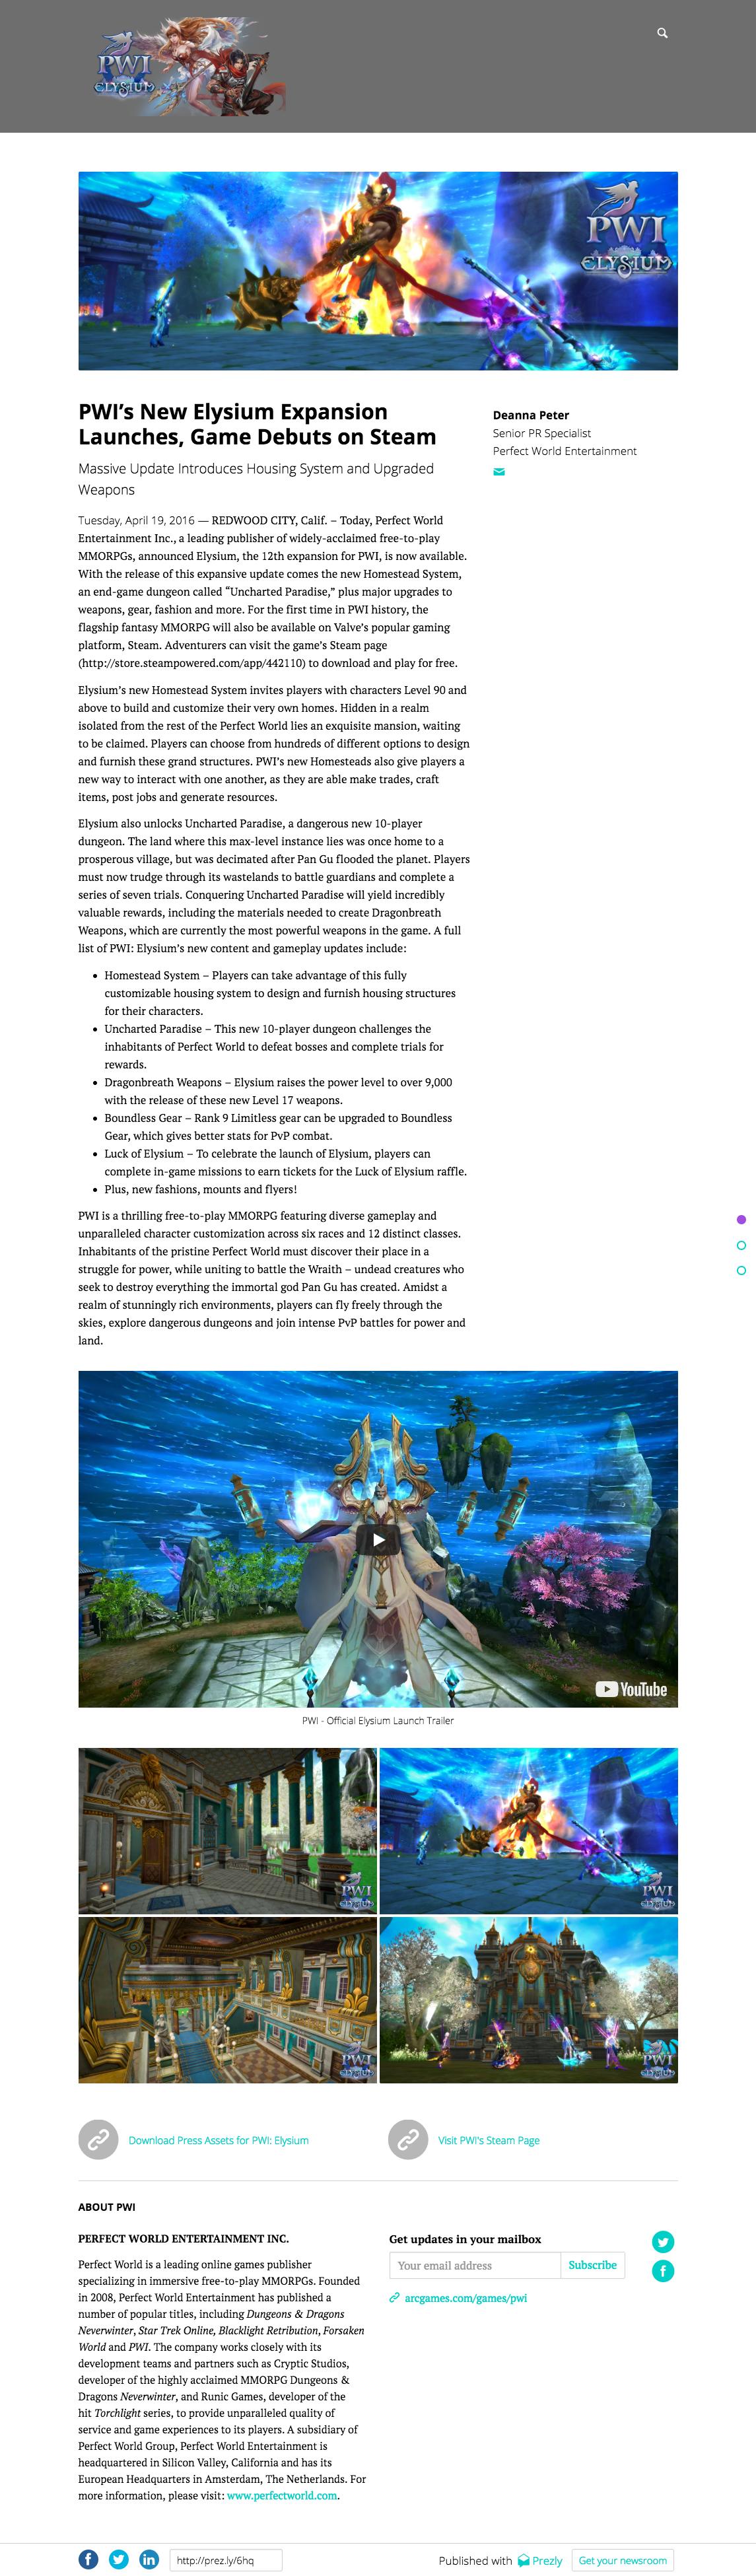 Press release content